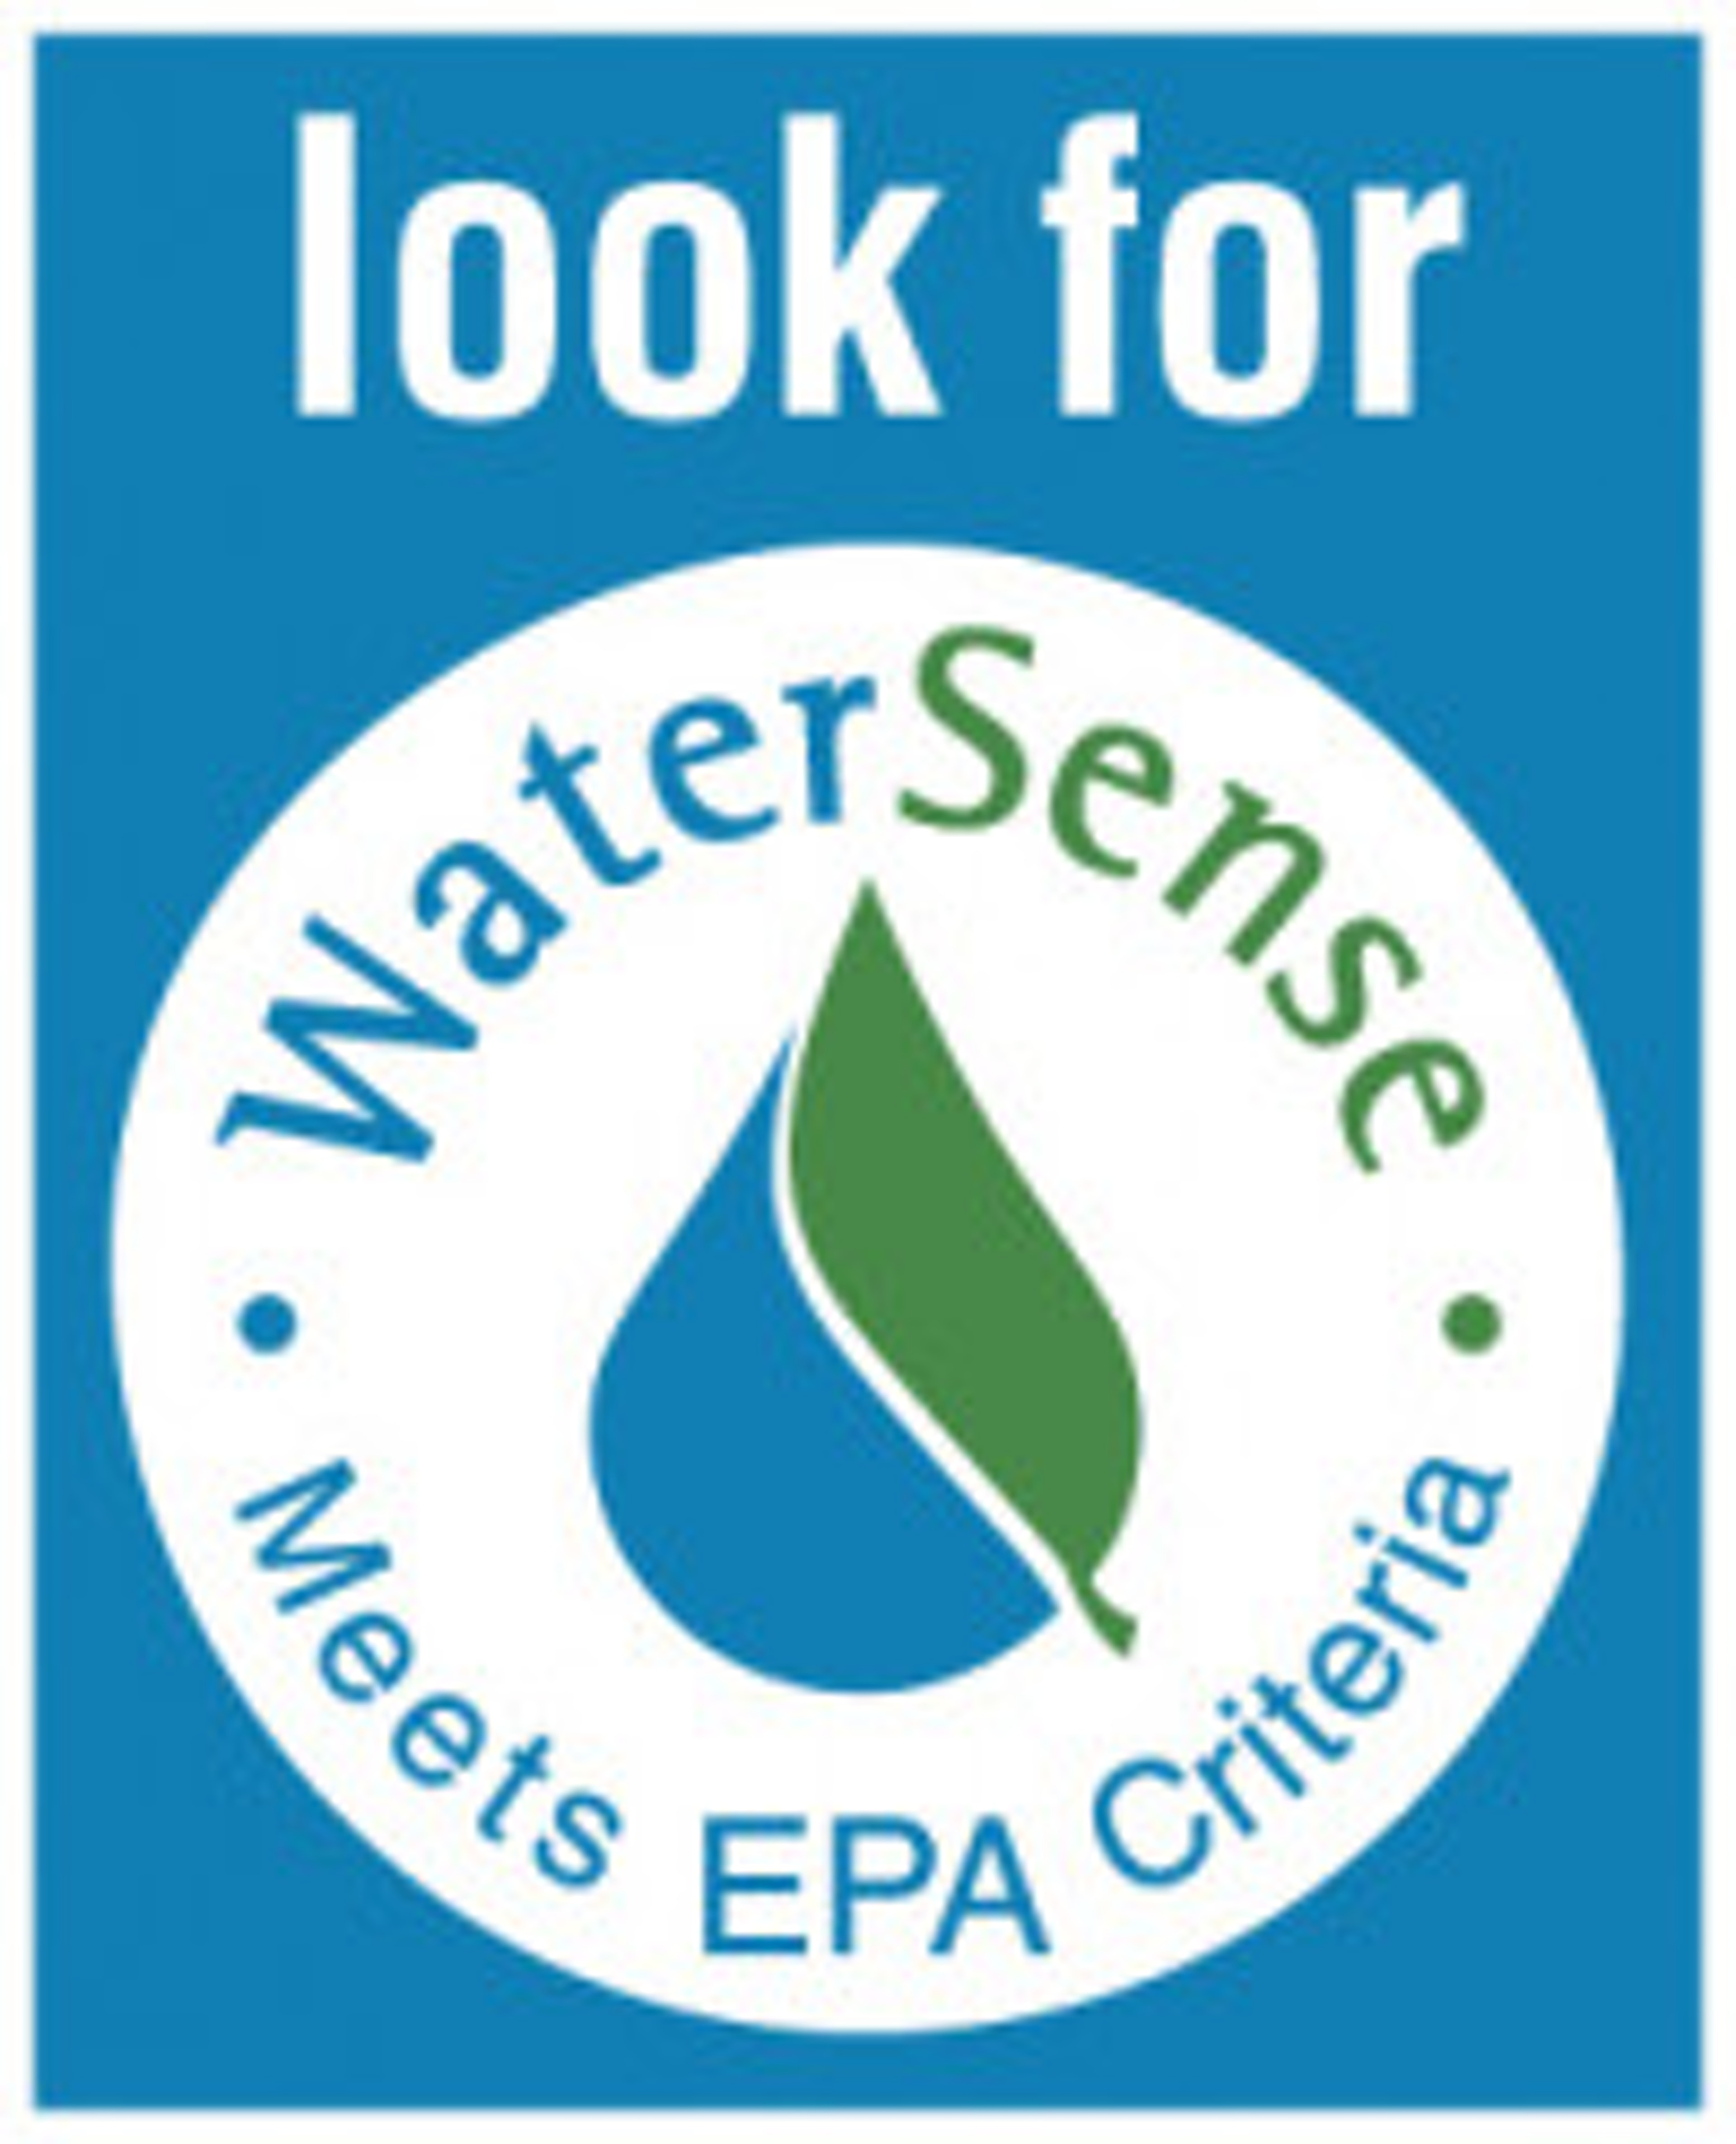 Look for WaterSense Logo